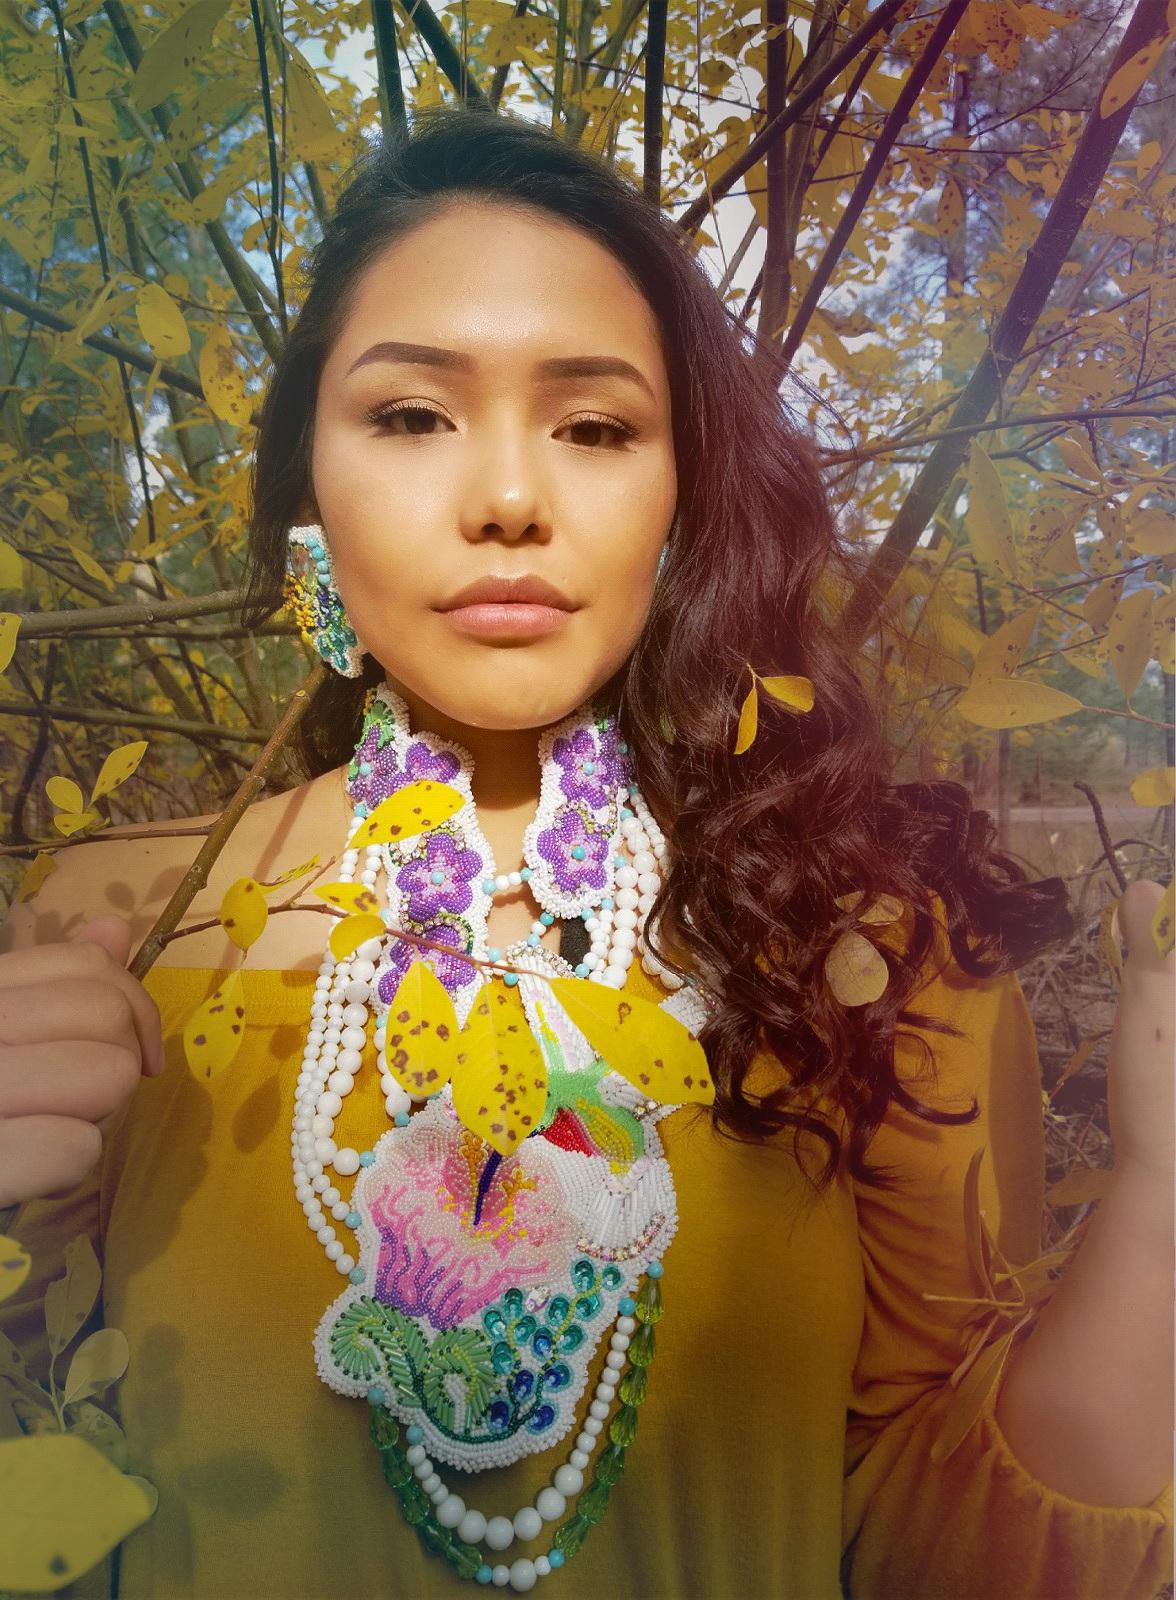 Women In Saree: Five Indigenous Women Rock Business With Beauty